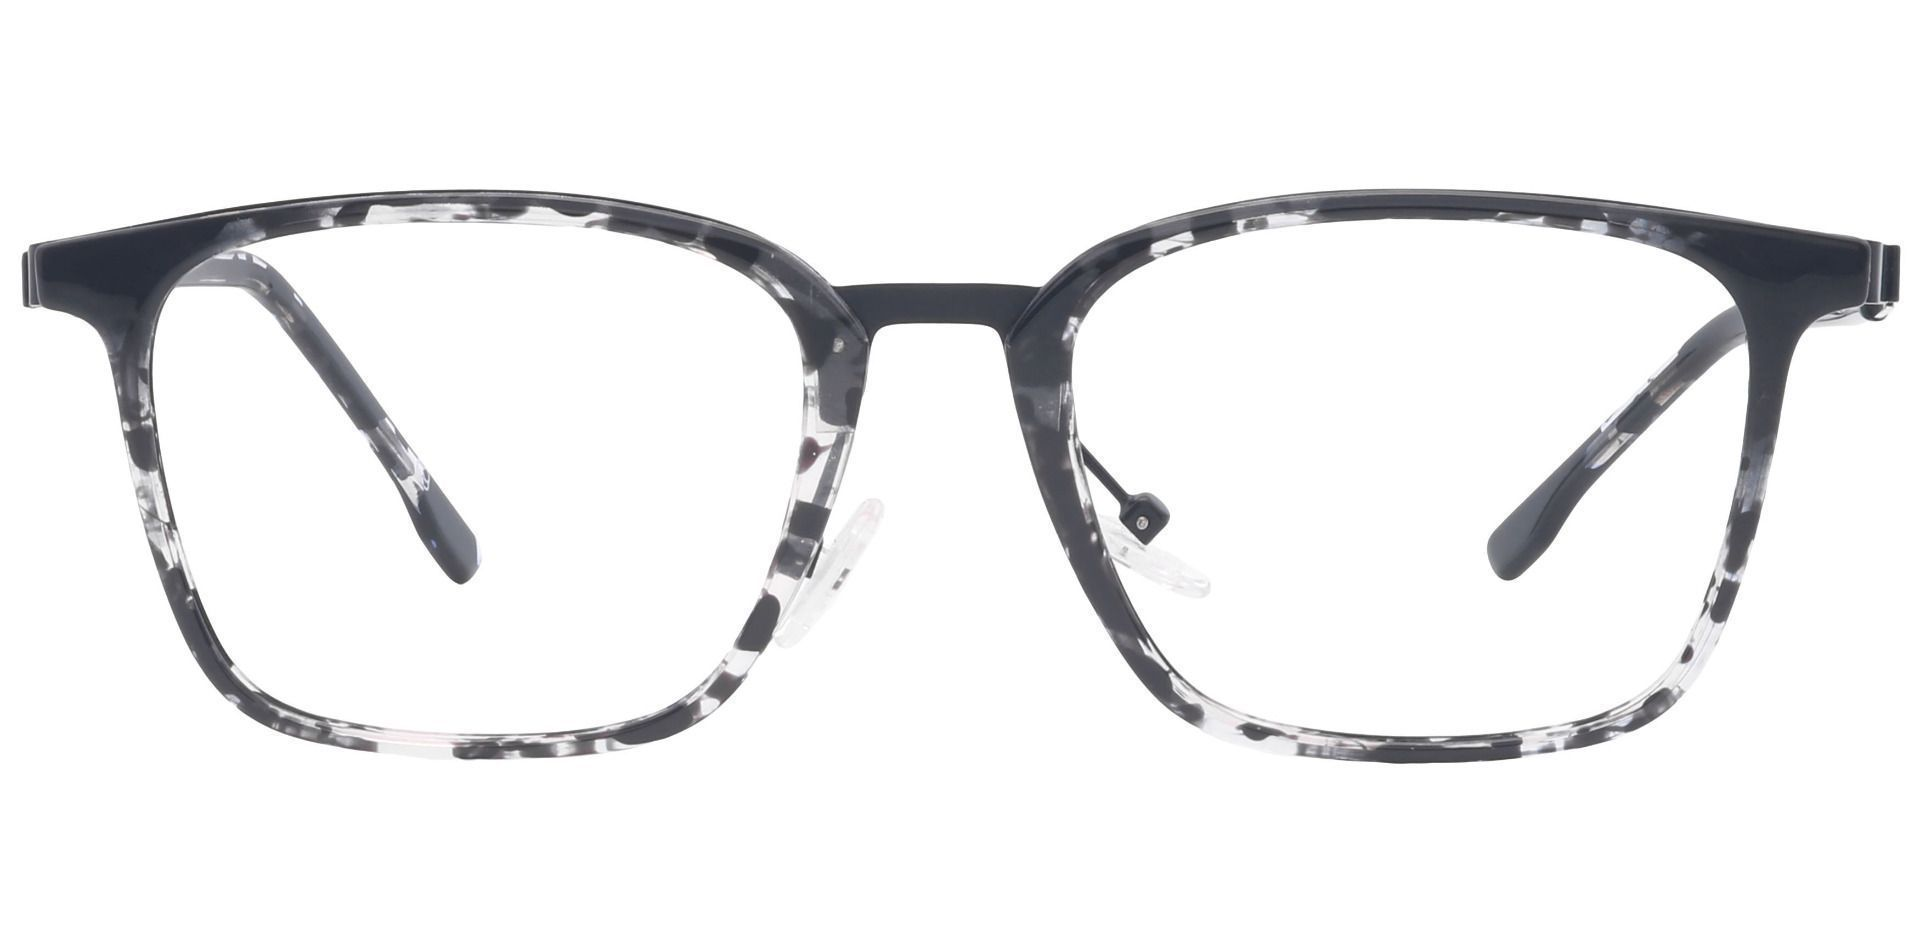 Rigby Oval Eyeglasses Frame - Floral